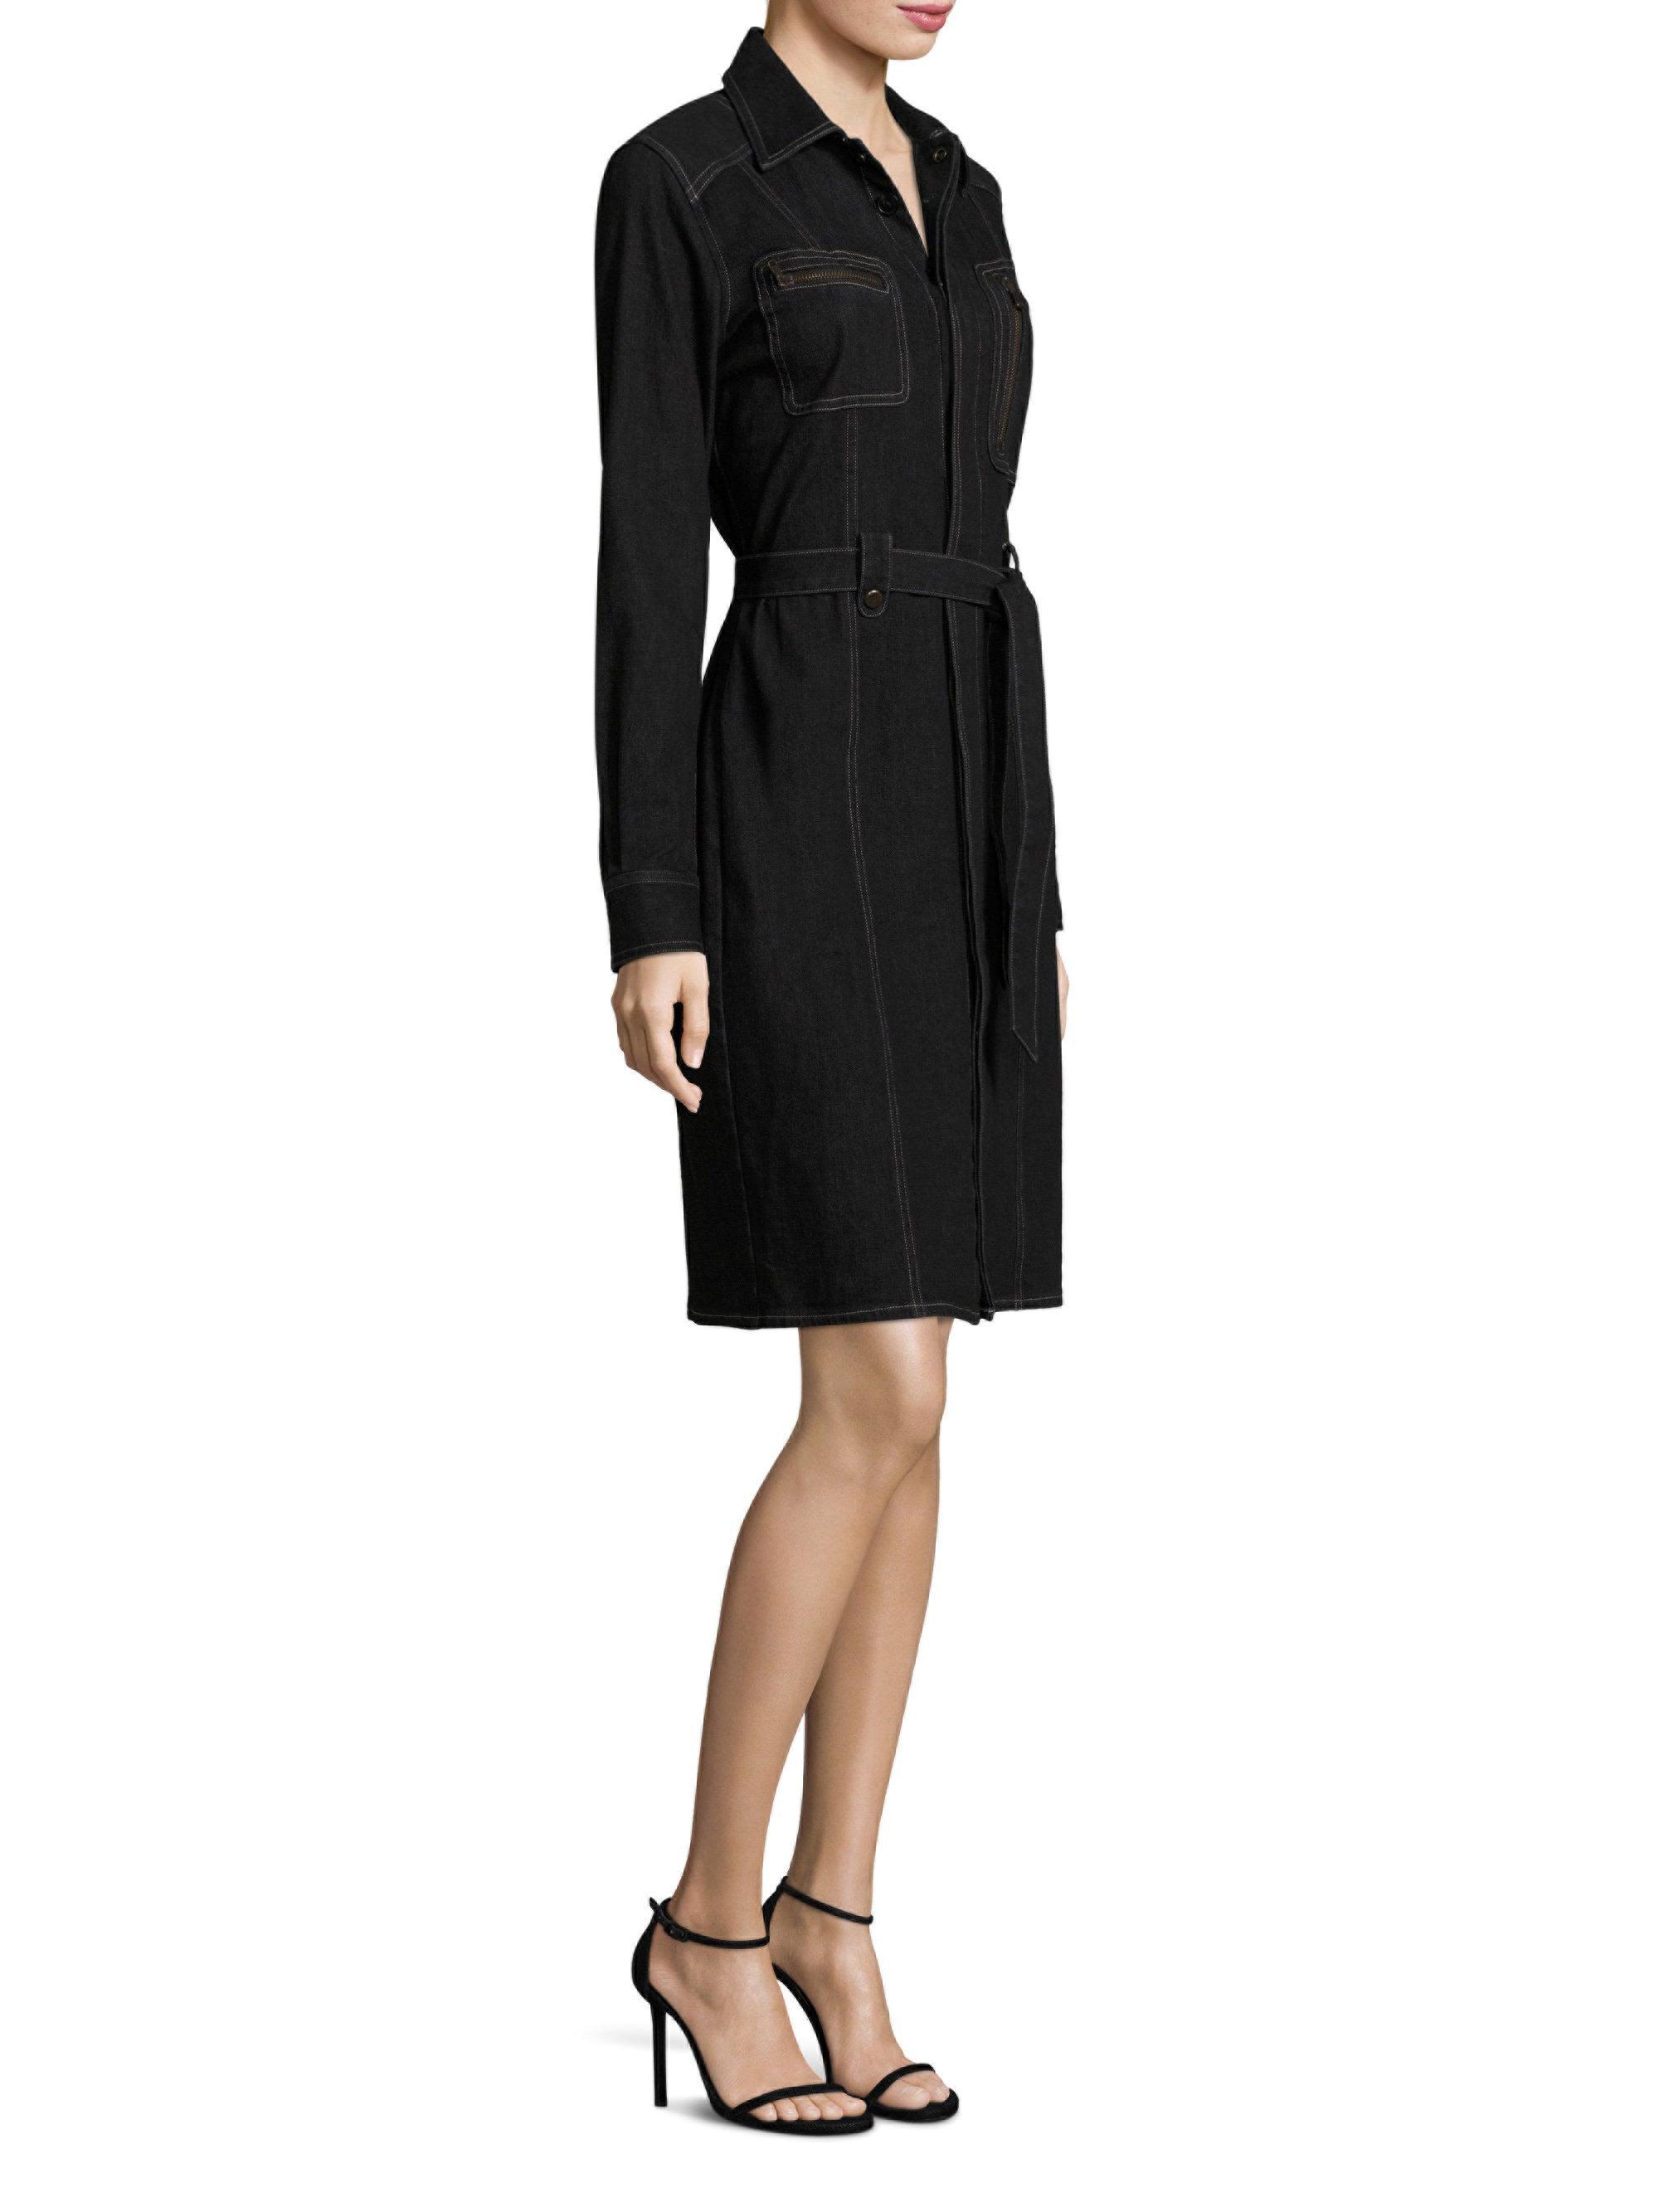 008dcc95975 Lyst - Polo Ralph Lauren Denim Utility Shirtdress in Black